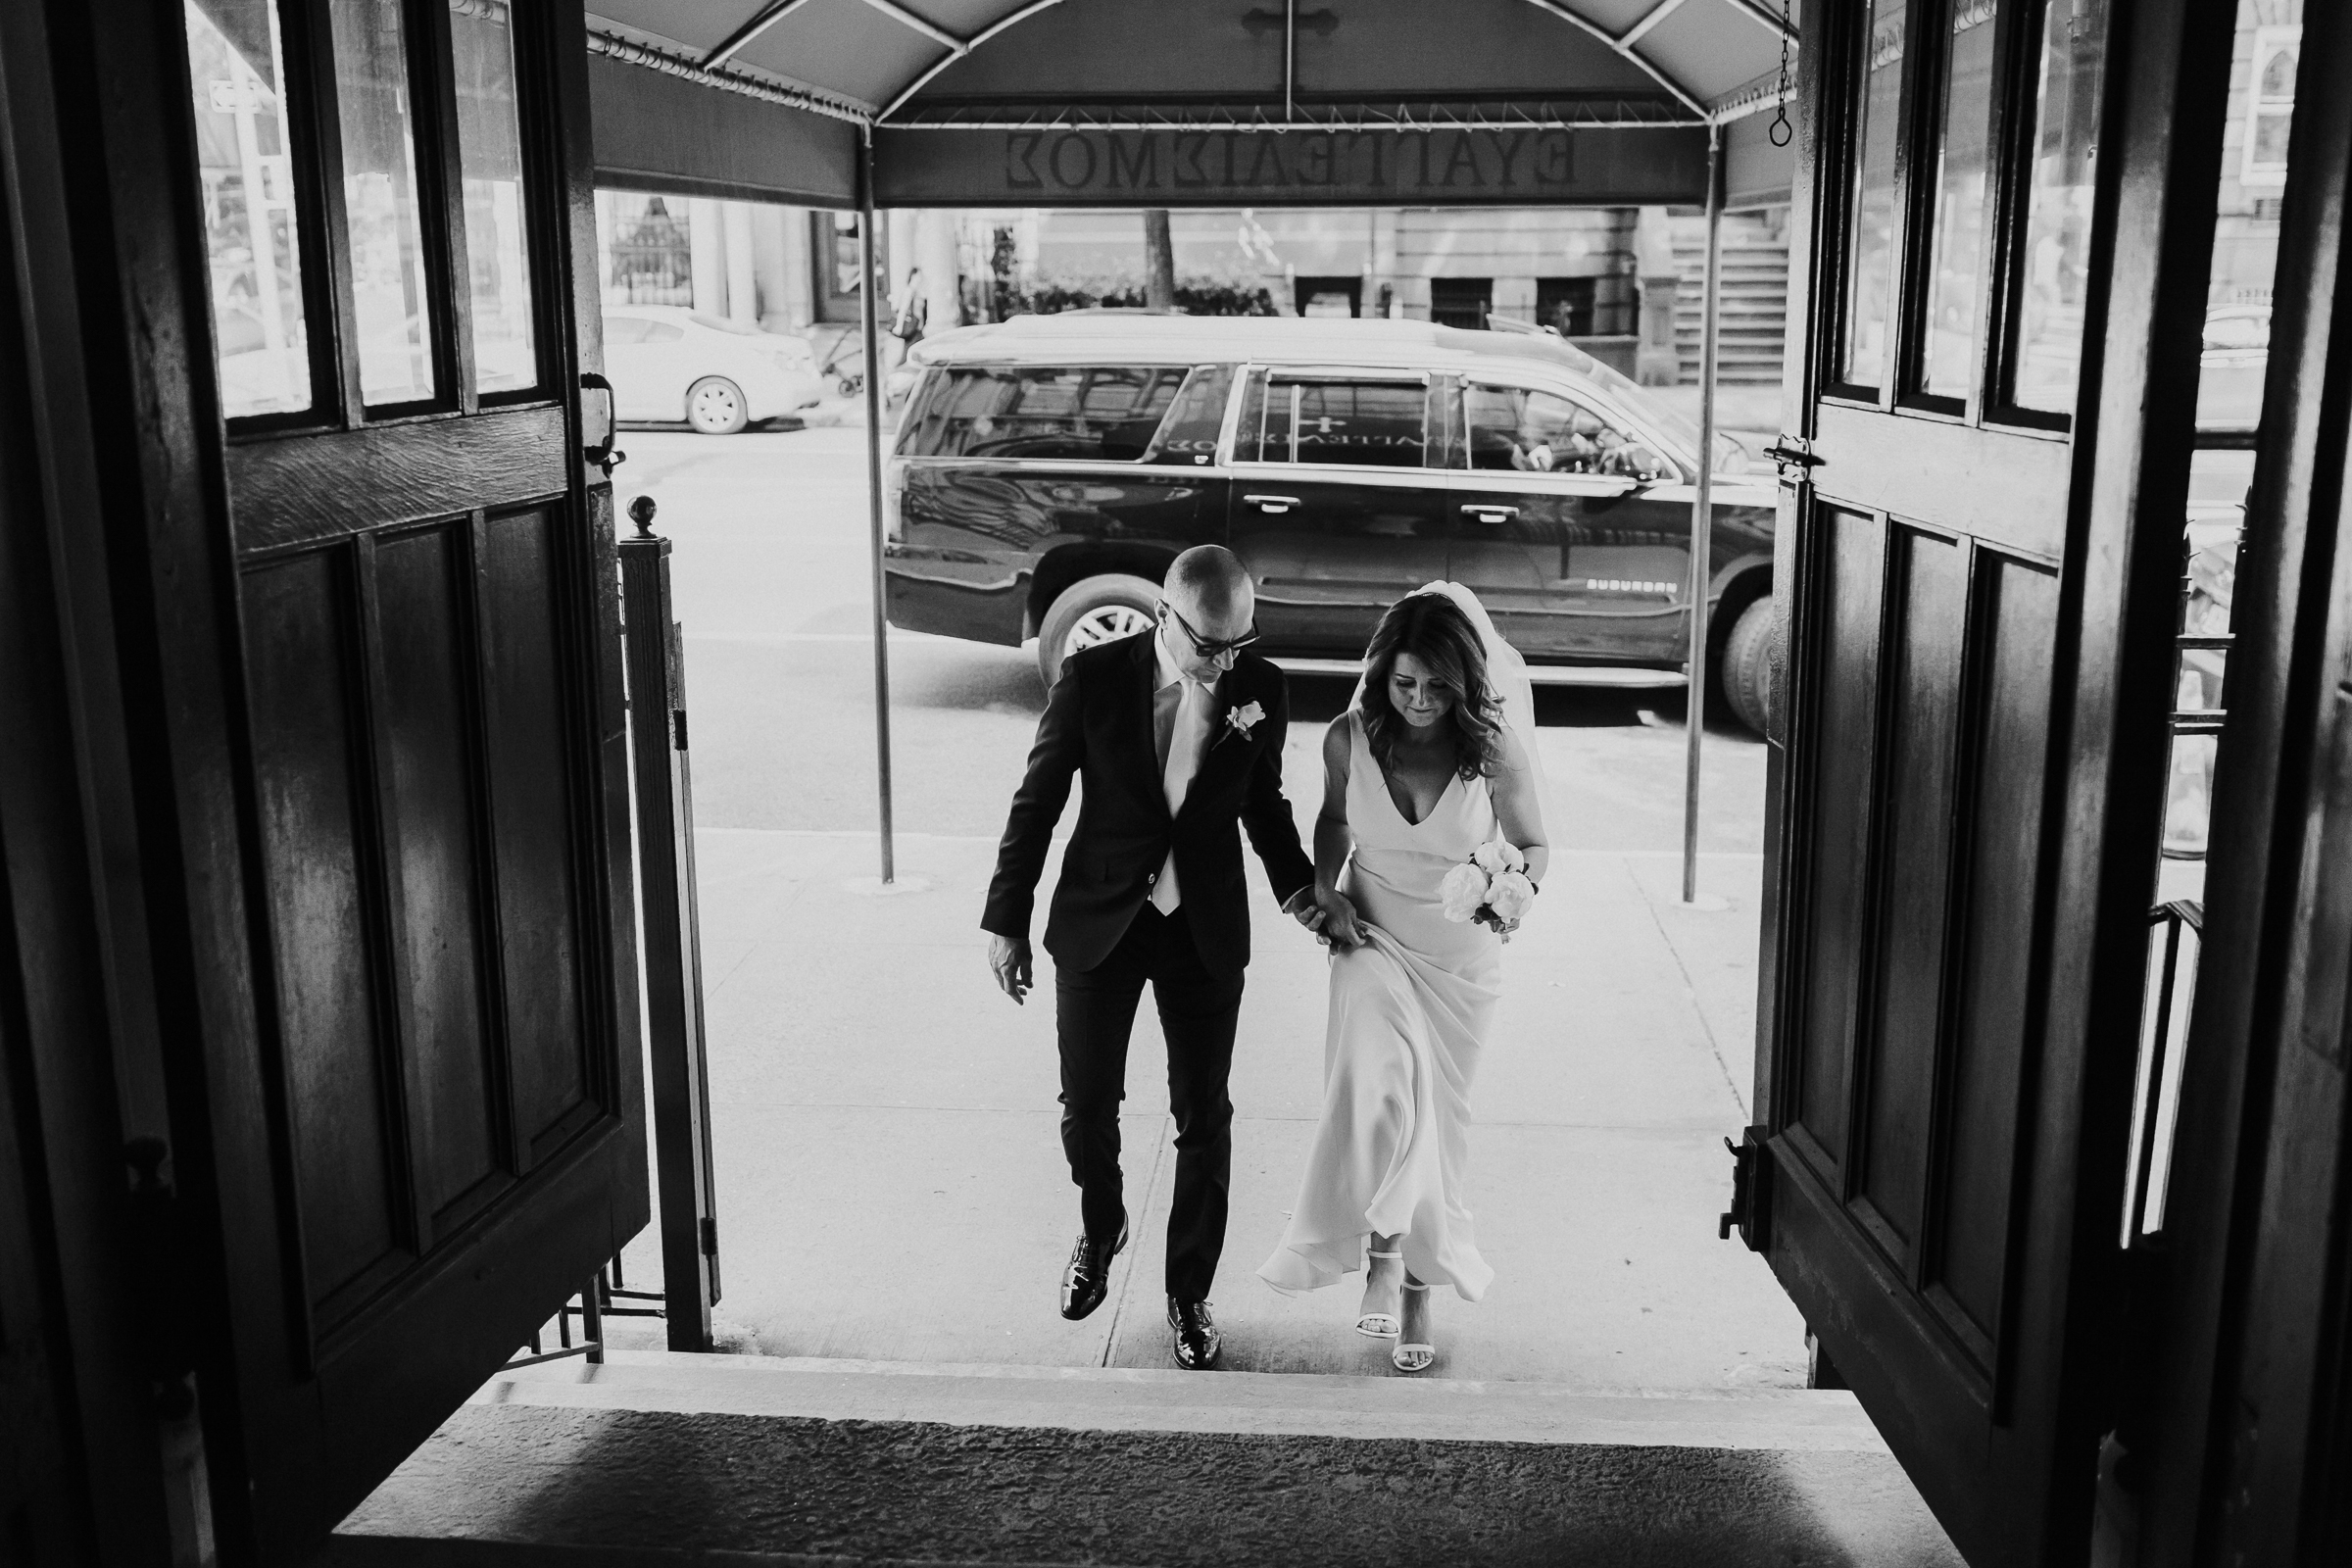 Robert-NYC-Museum-Of-Arts-&-Design-Greek-Italian-New-York-Documentary-Wedding-Photographer-8.jpg